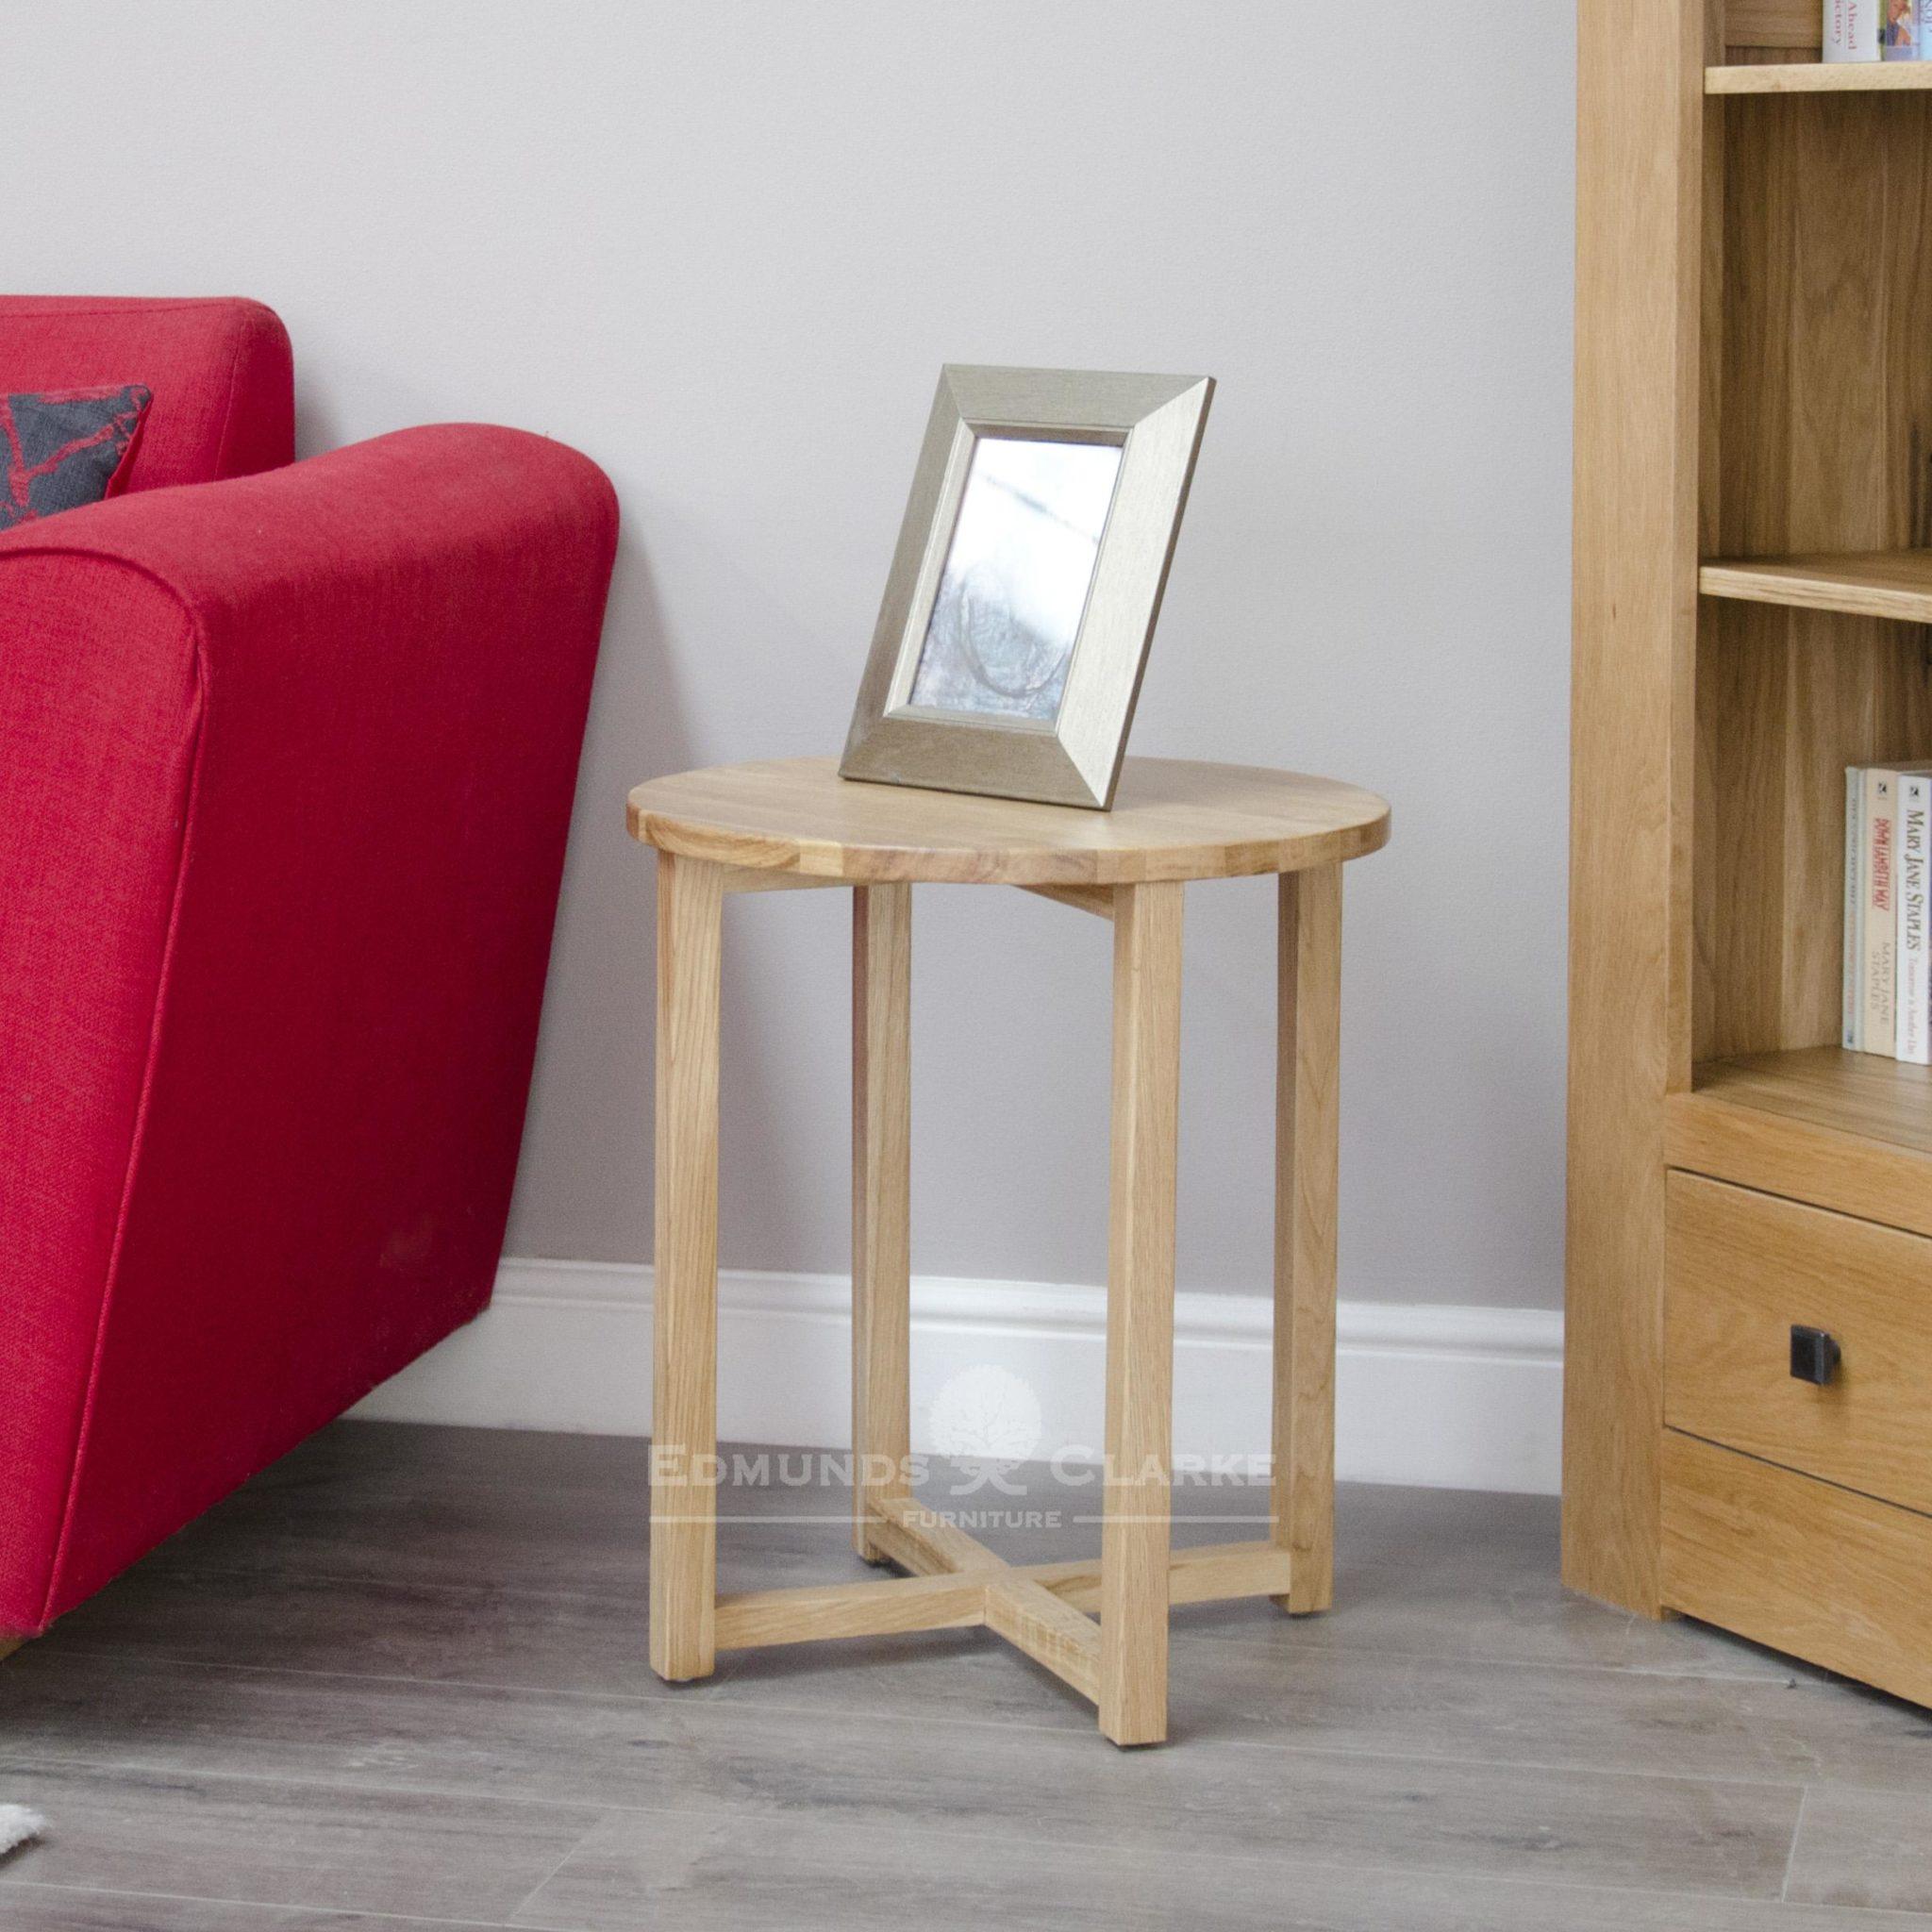 Bury solid oak round lamp table